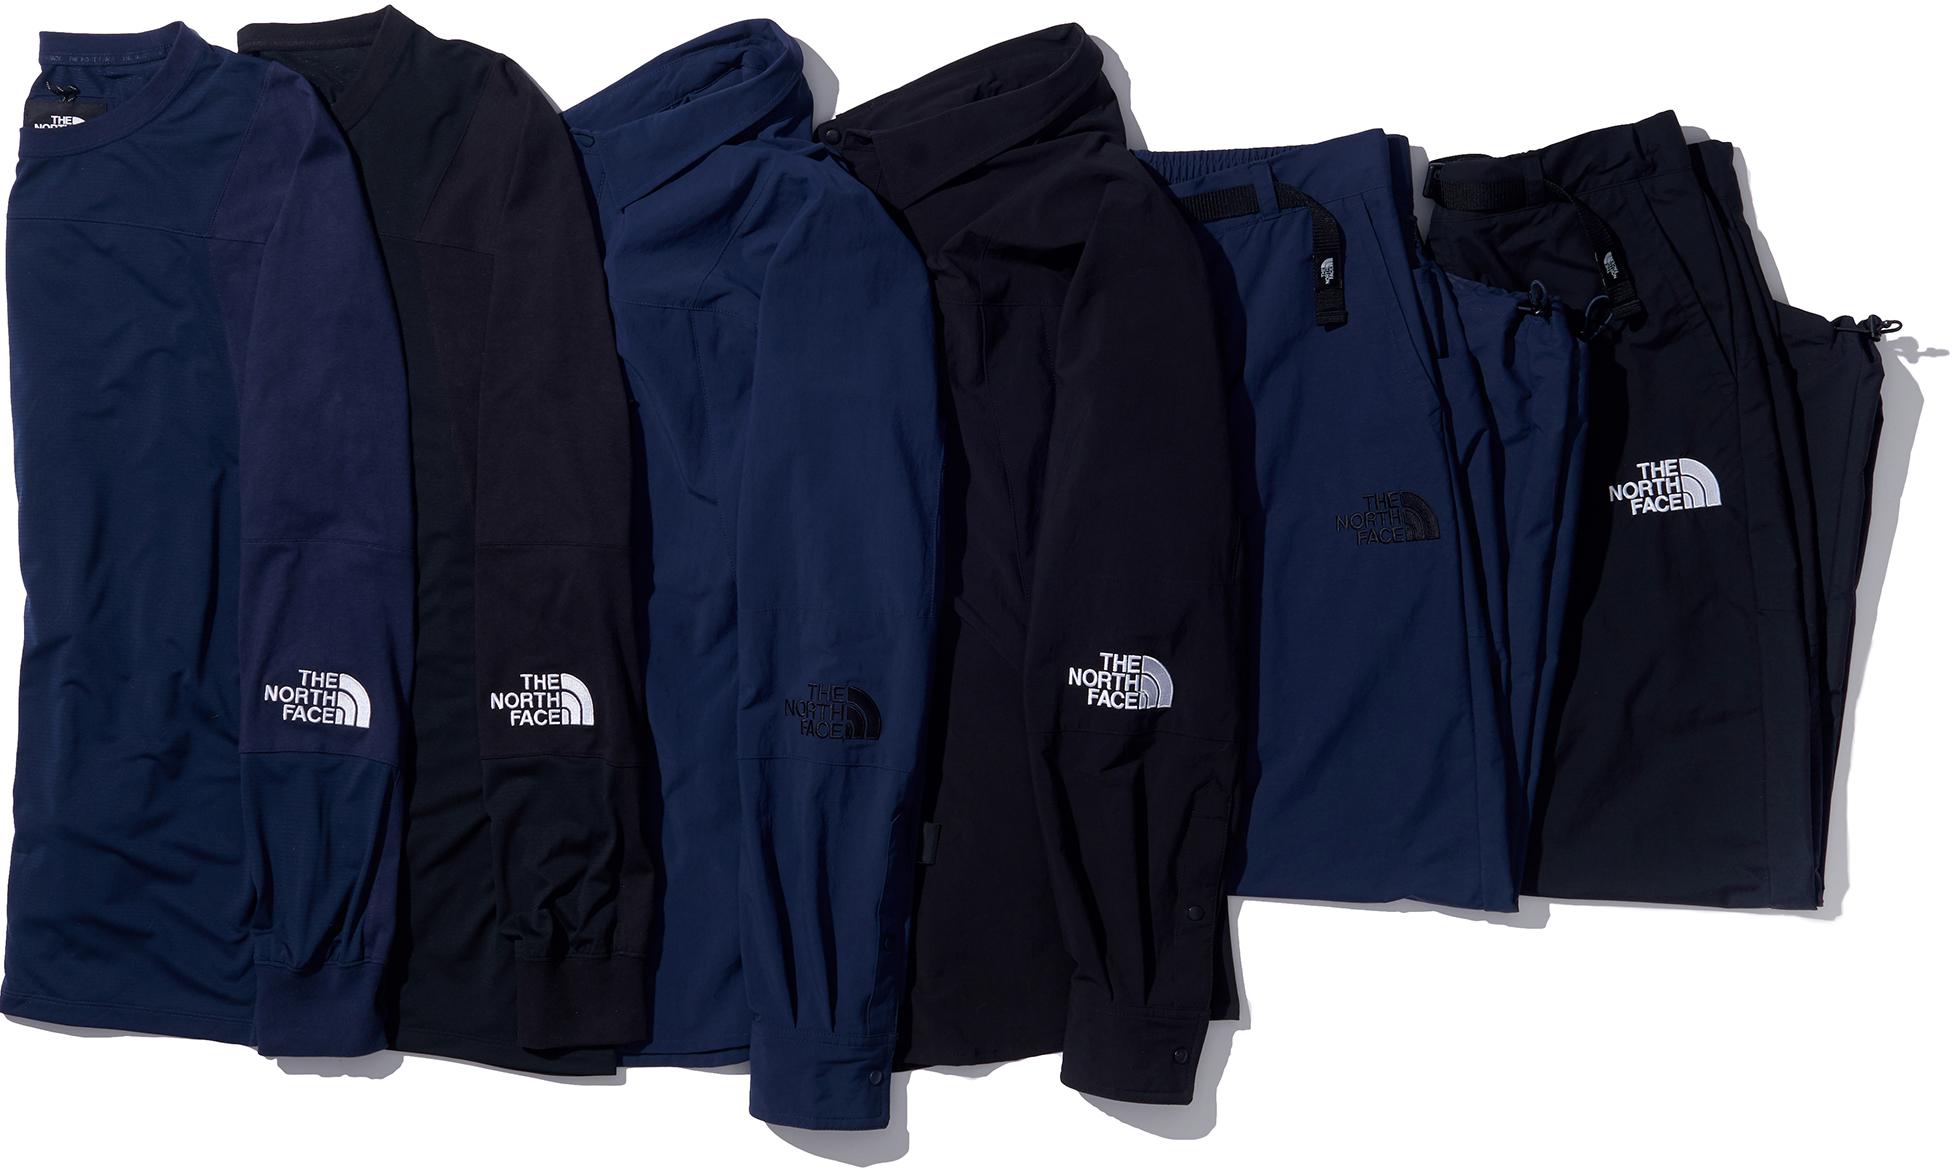 Bape x adidas Consortium 'Superbowl' Collection Raffle